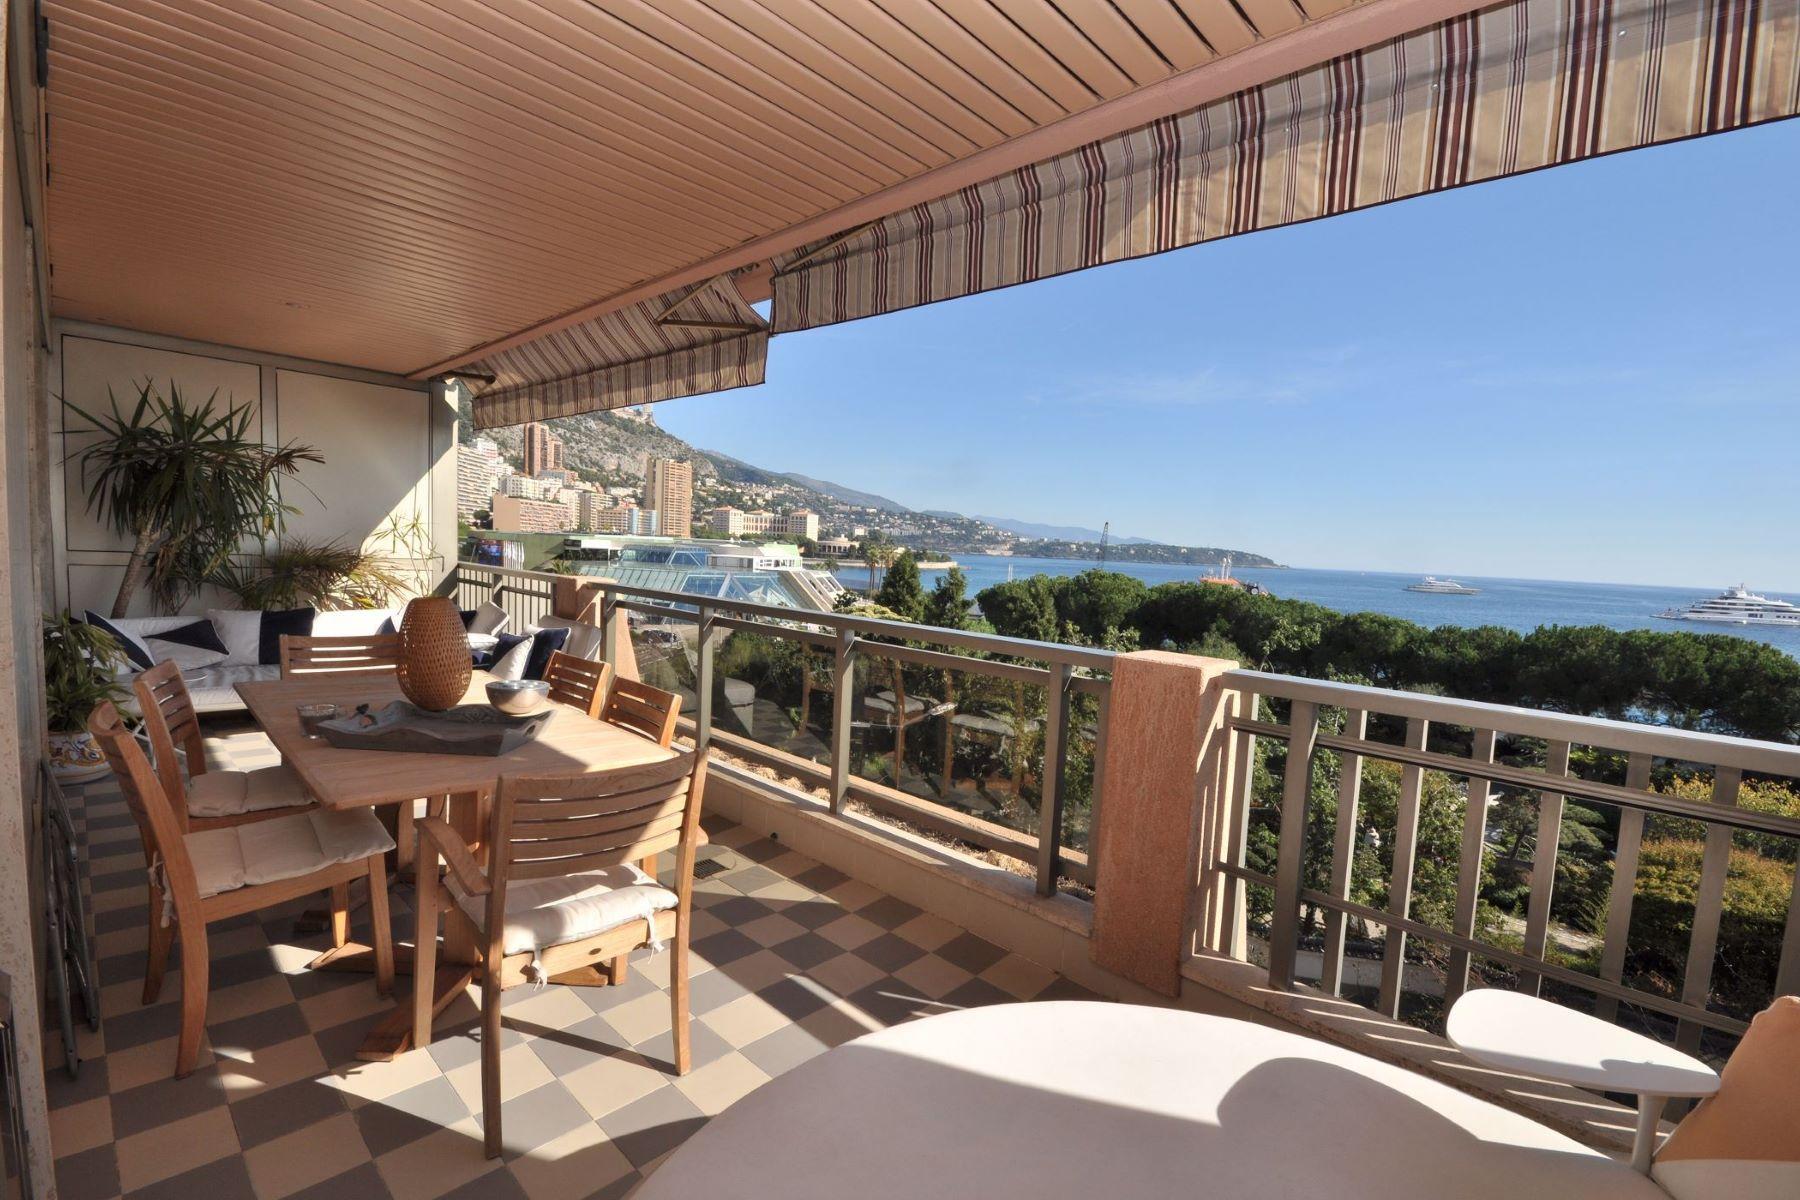 Apartments for Sale at The Reserve, Beautiful 1 bedroom flat on the seaside. Monaco, La Condamine 98000 Monaco